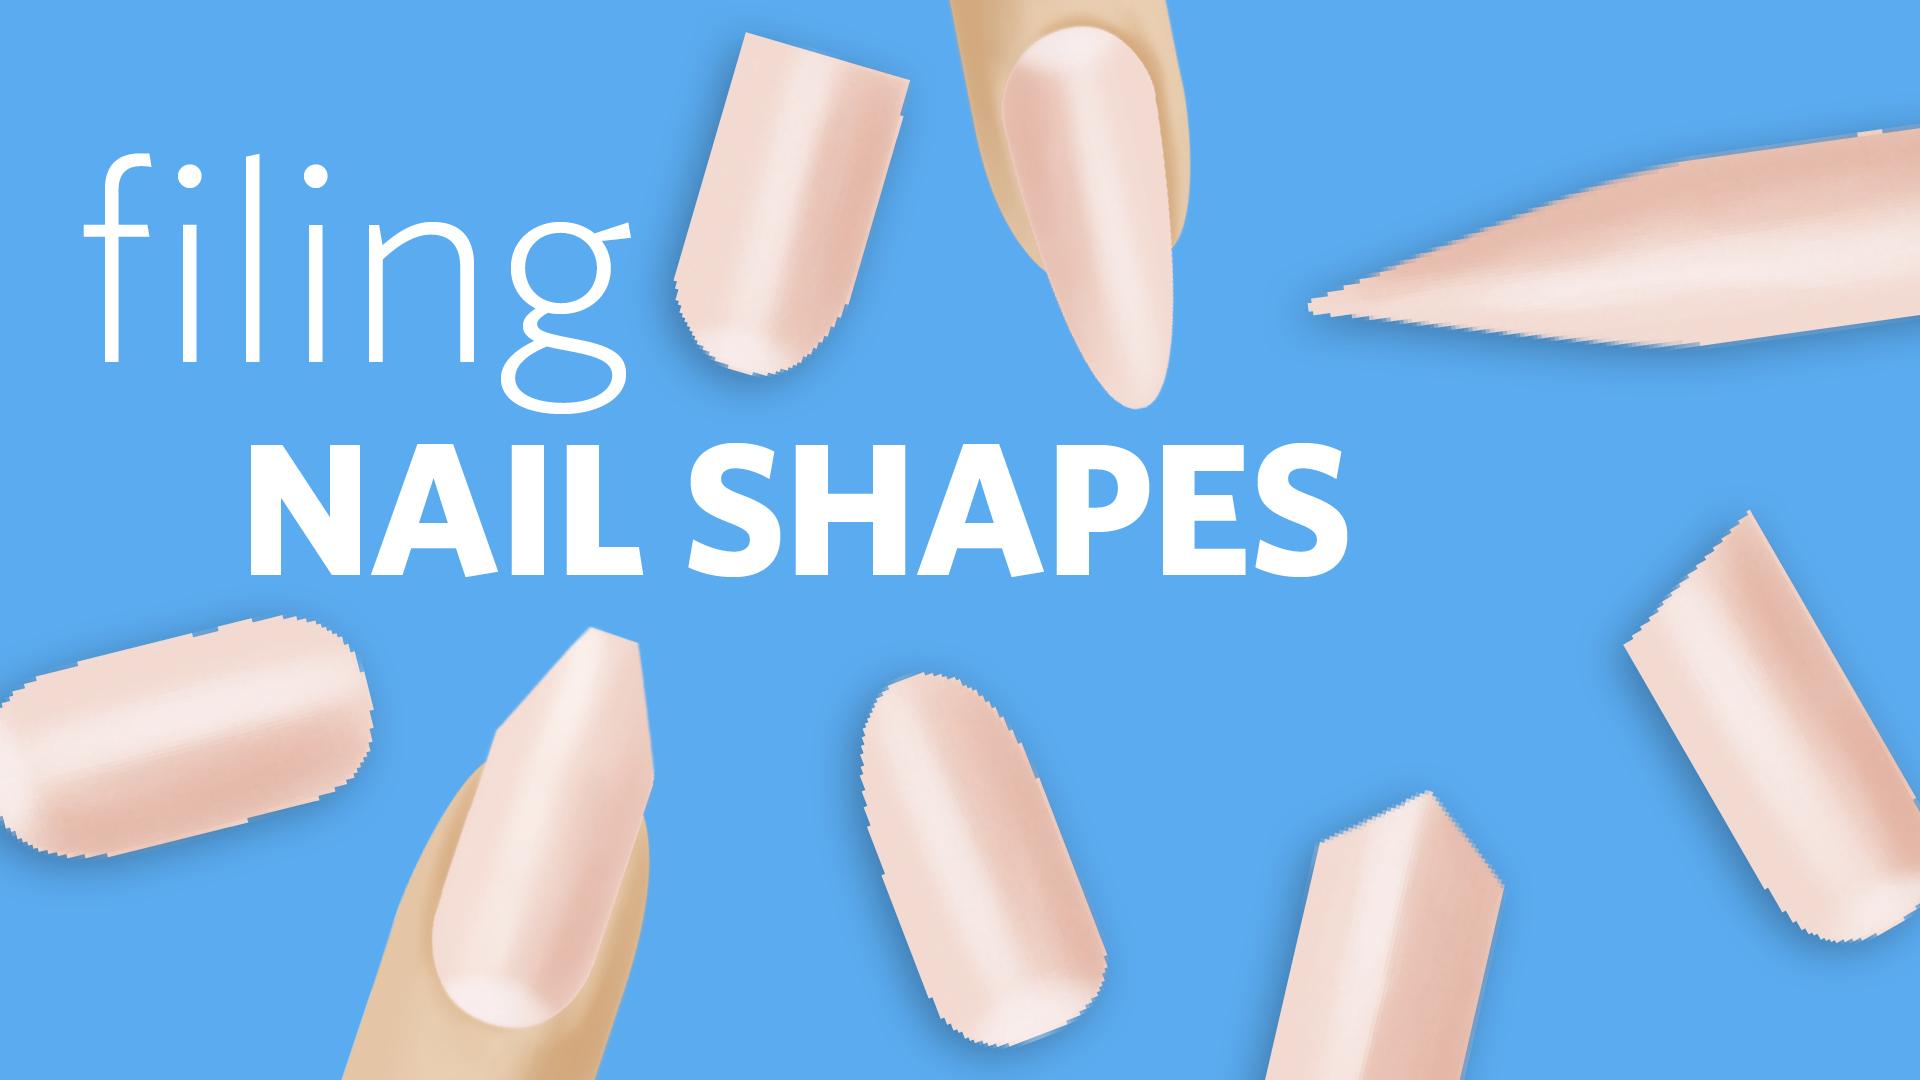 Filing 8 Nail Shapes (combined)